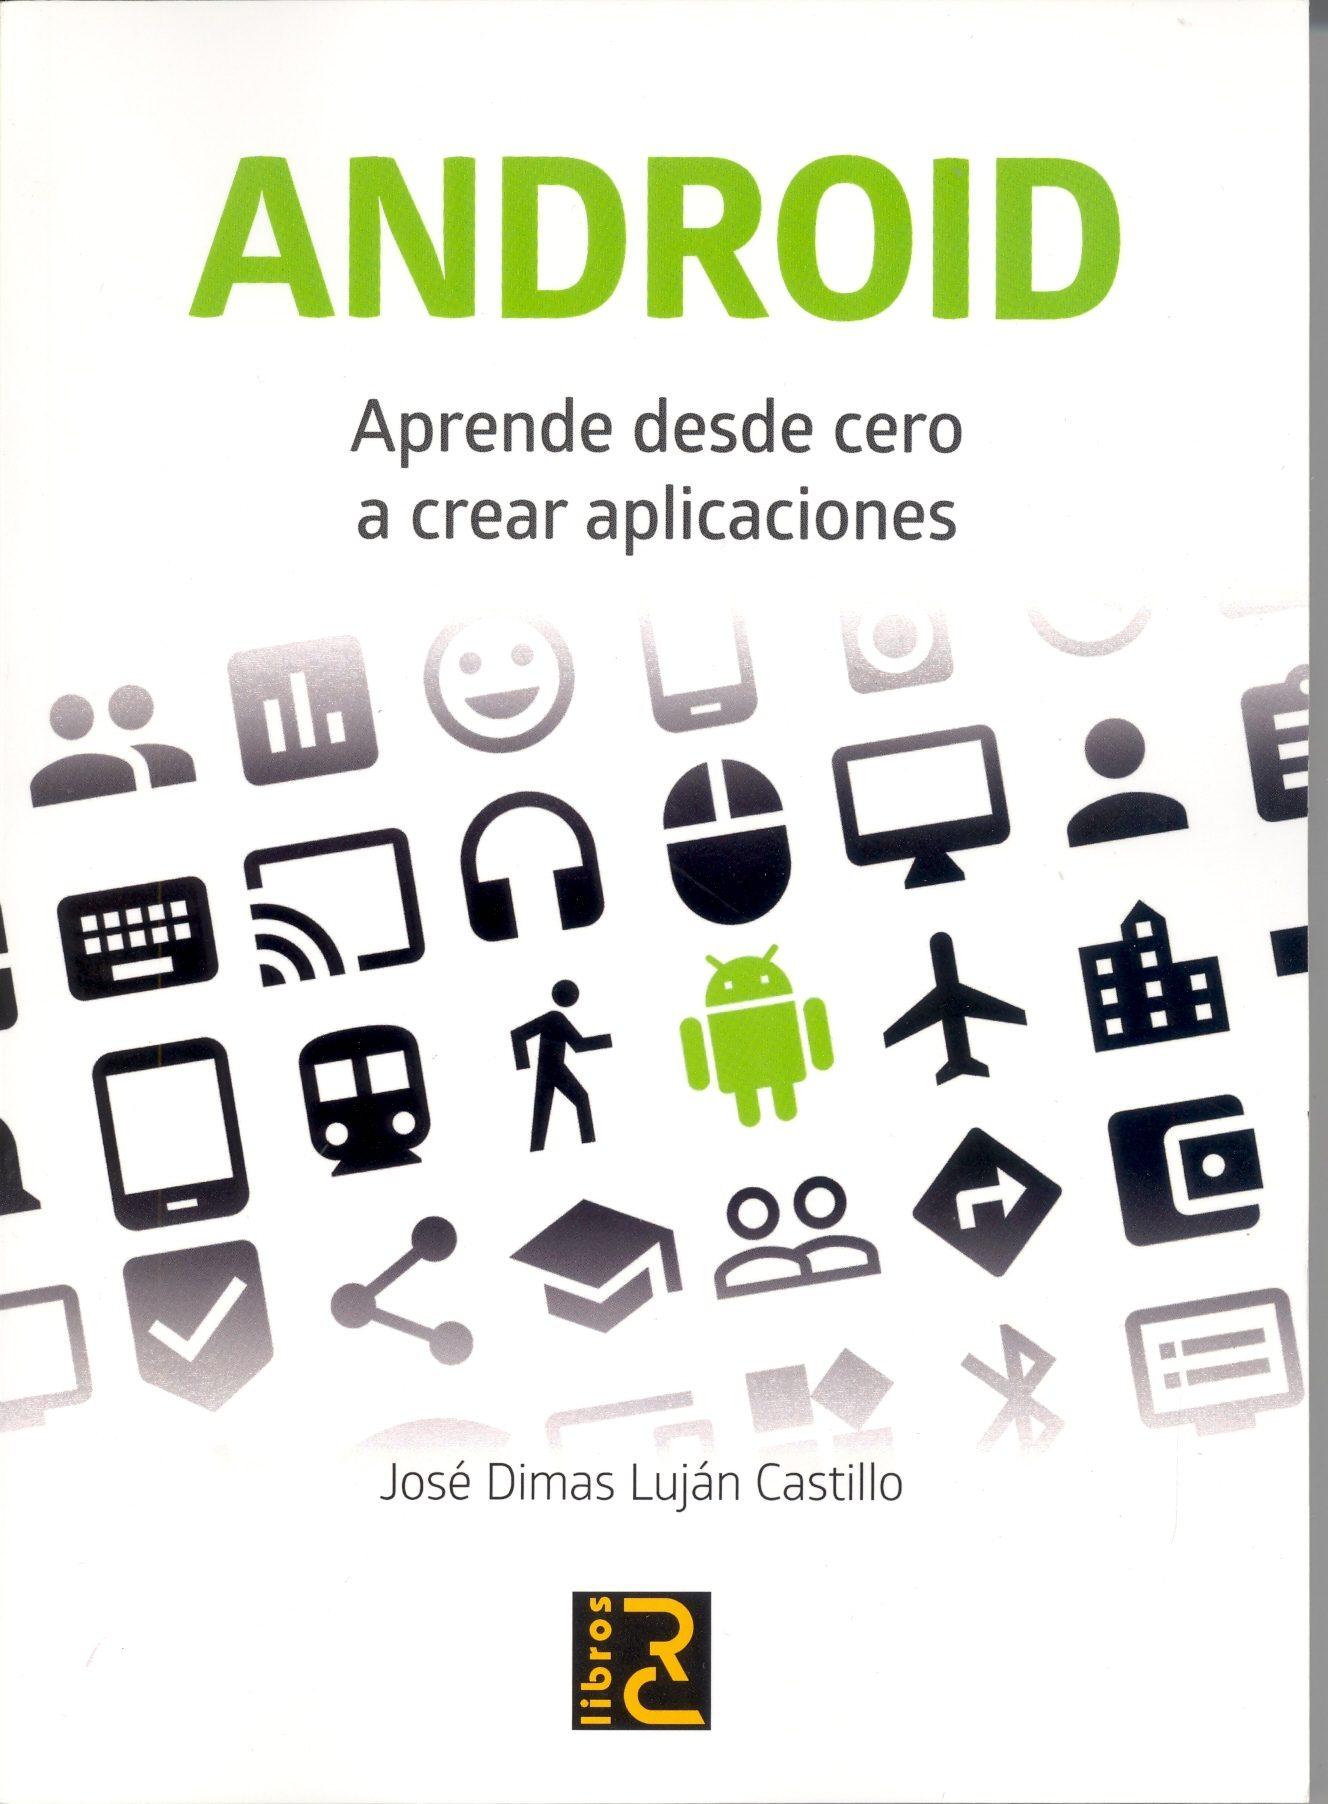 Android aprende desde cero a crear aplicaciones jose dimas android aprende desde cero a crear aplicaciones jose dimas lujan castillo 9788494305580 fandeluxe Image collections